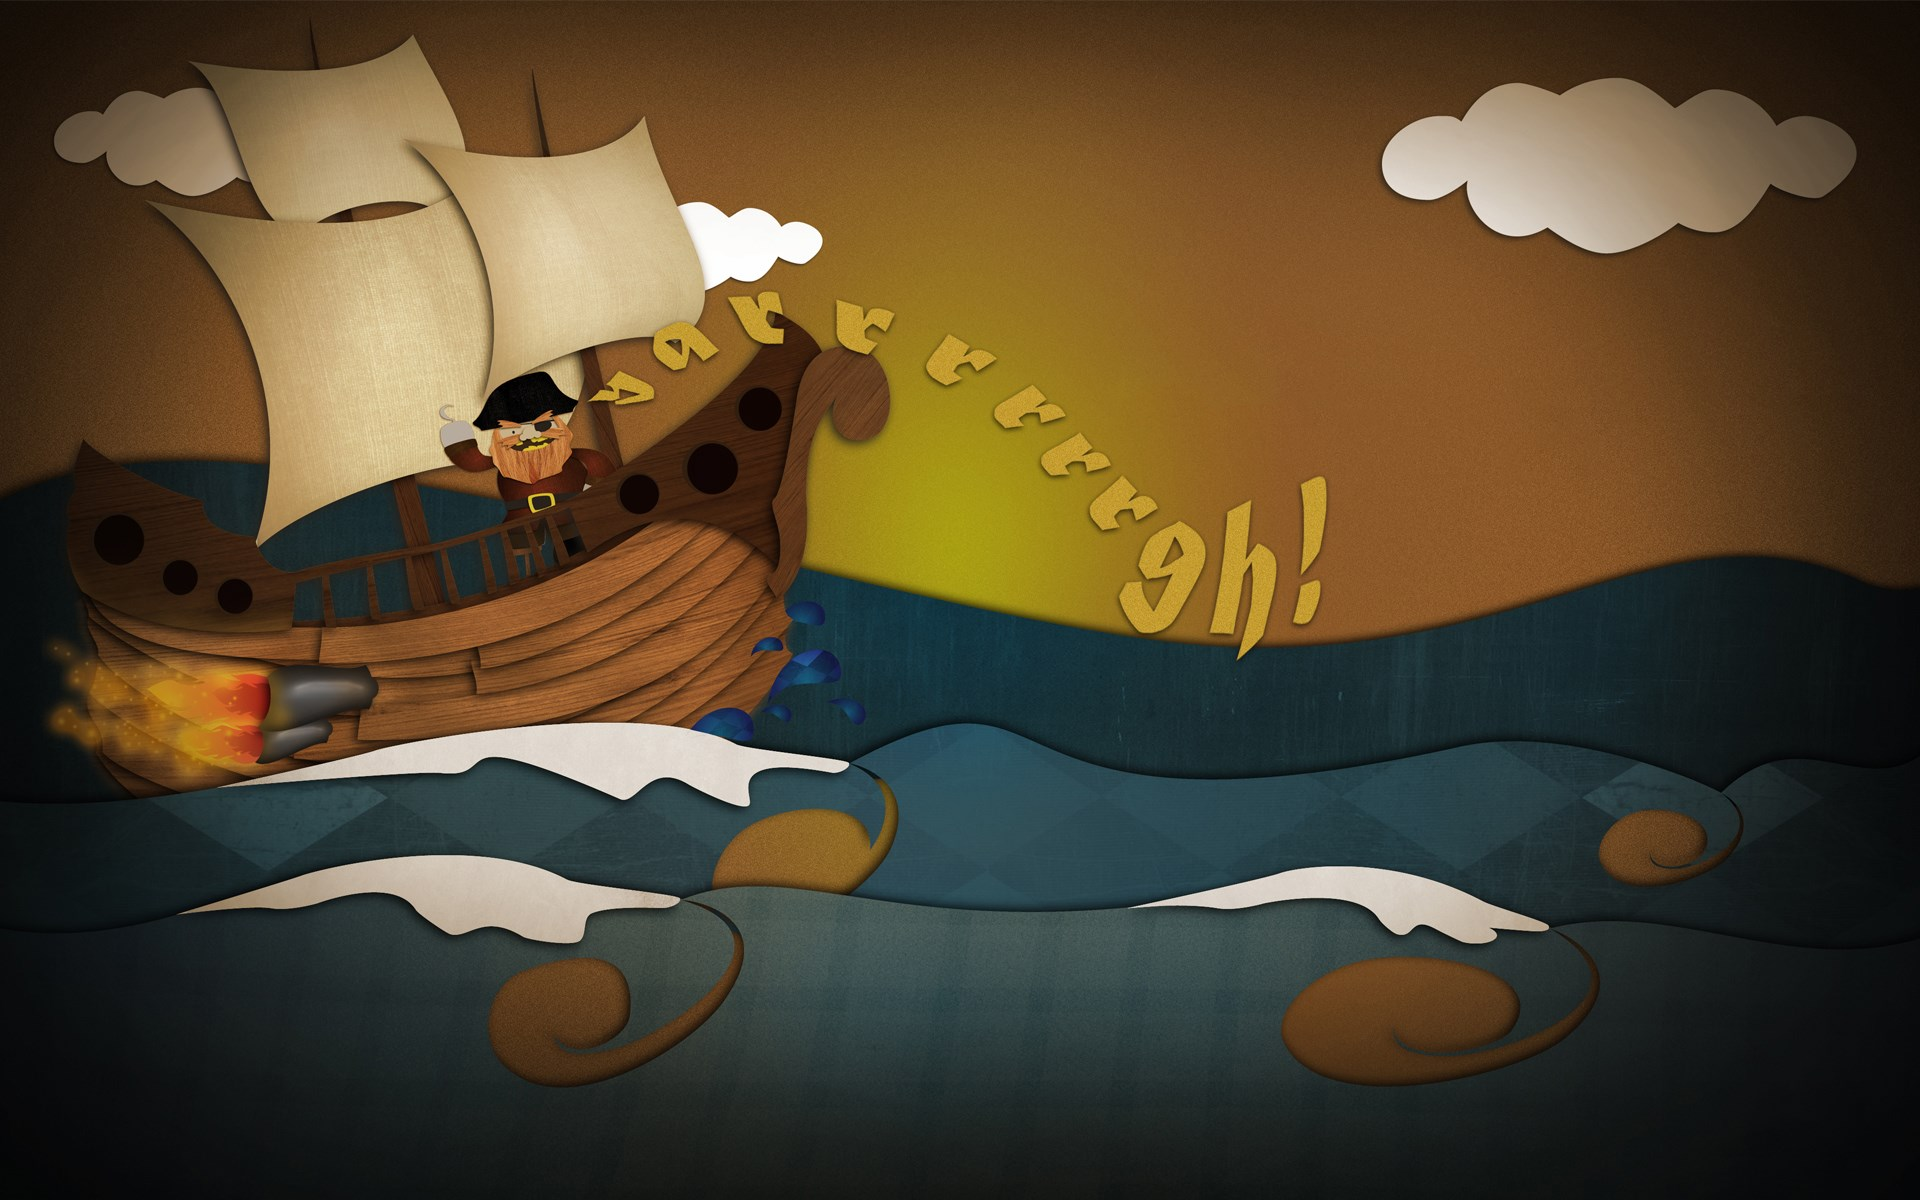 Pirate Ship Art Cartoon